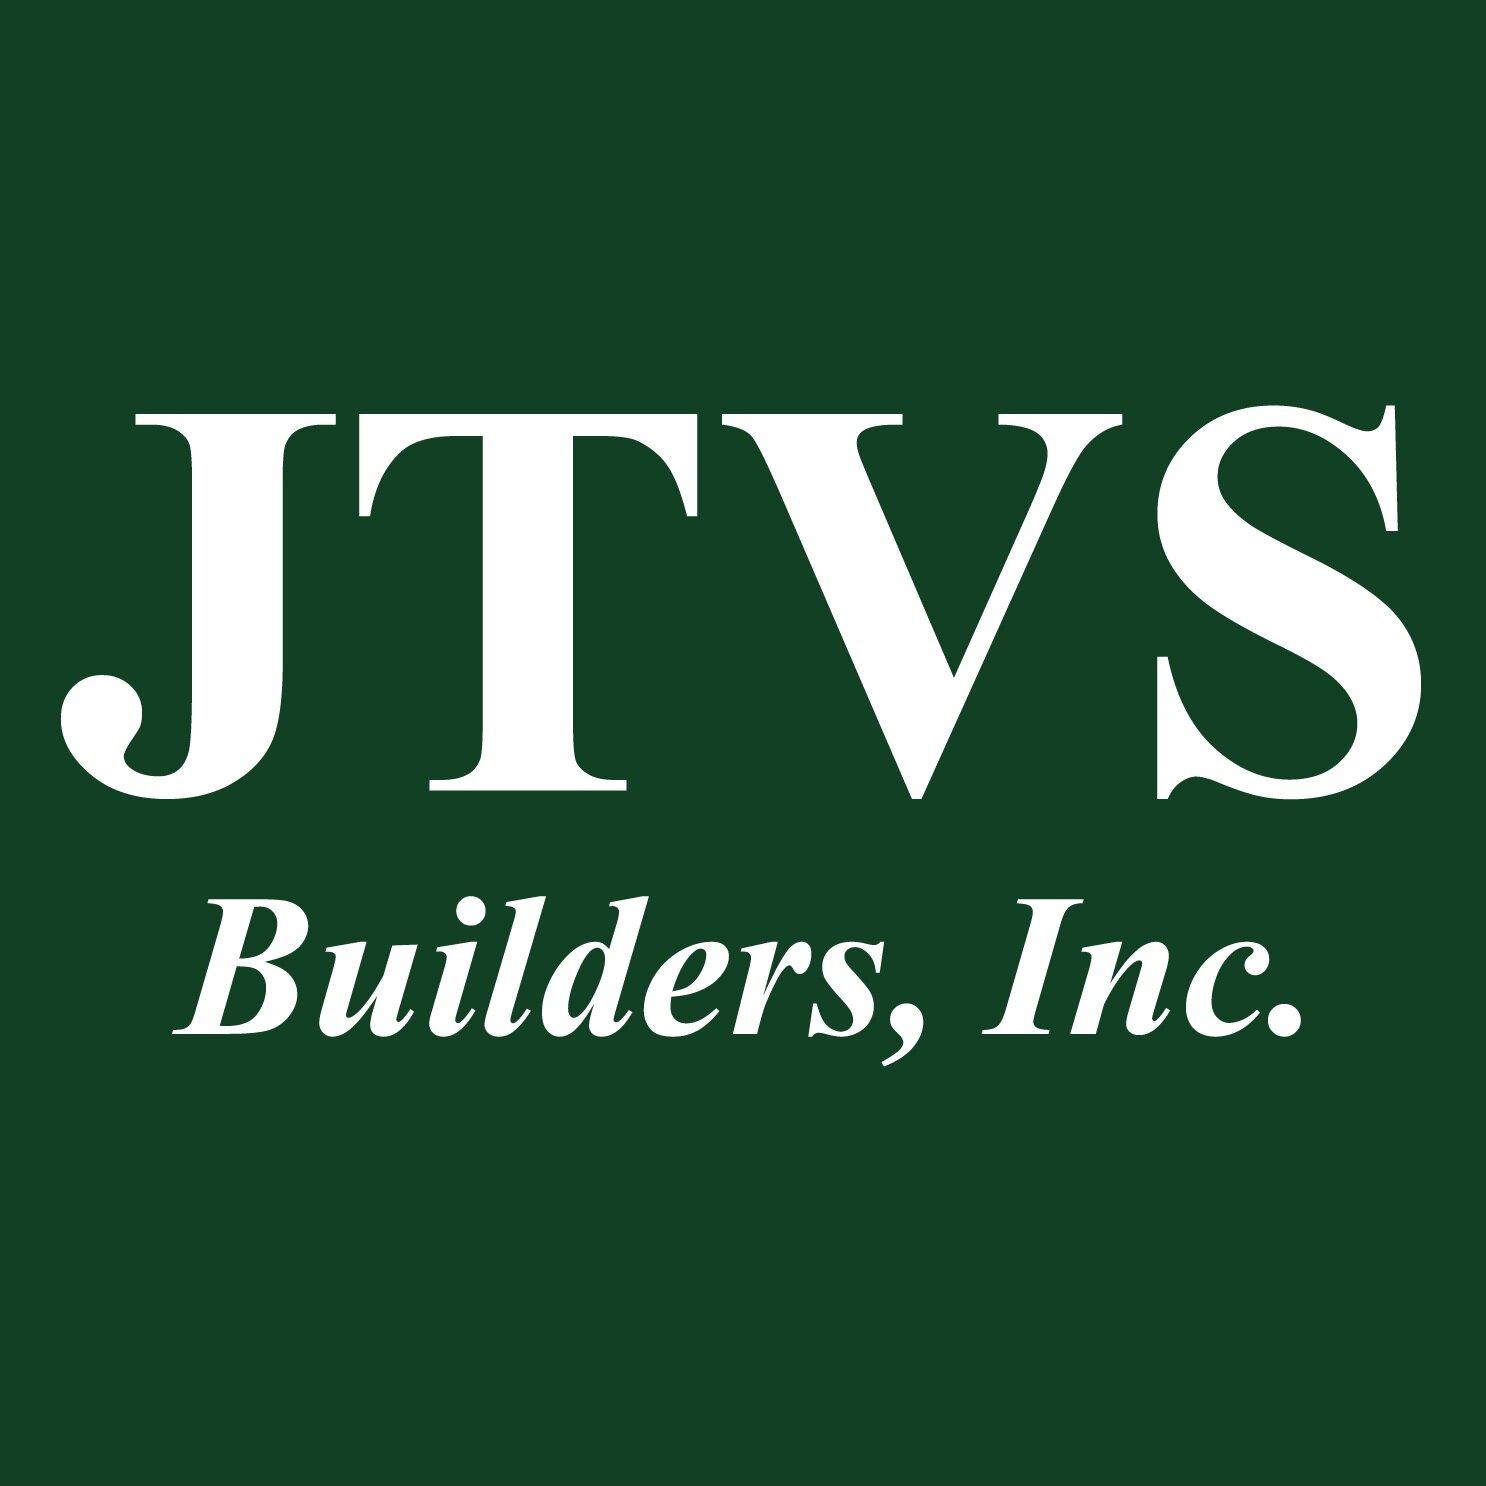 JTVS+Brand+%402000.jpg